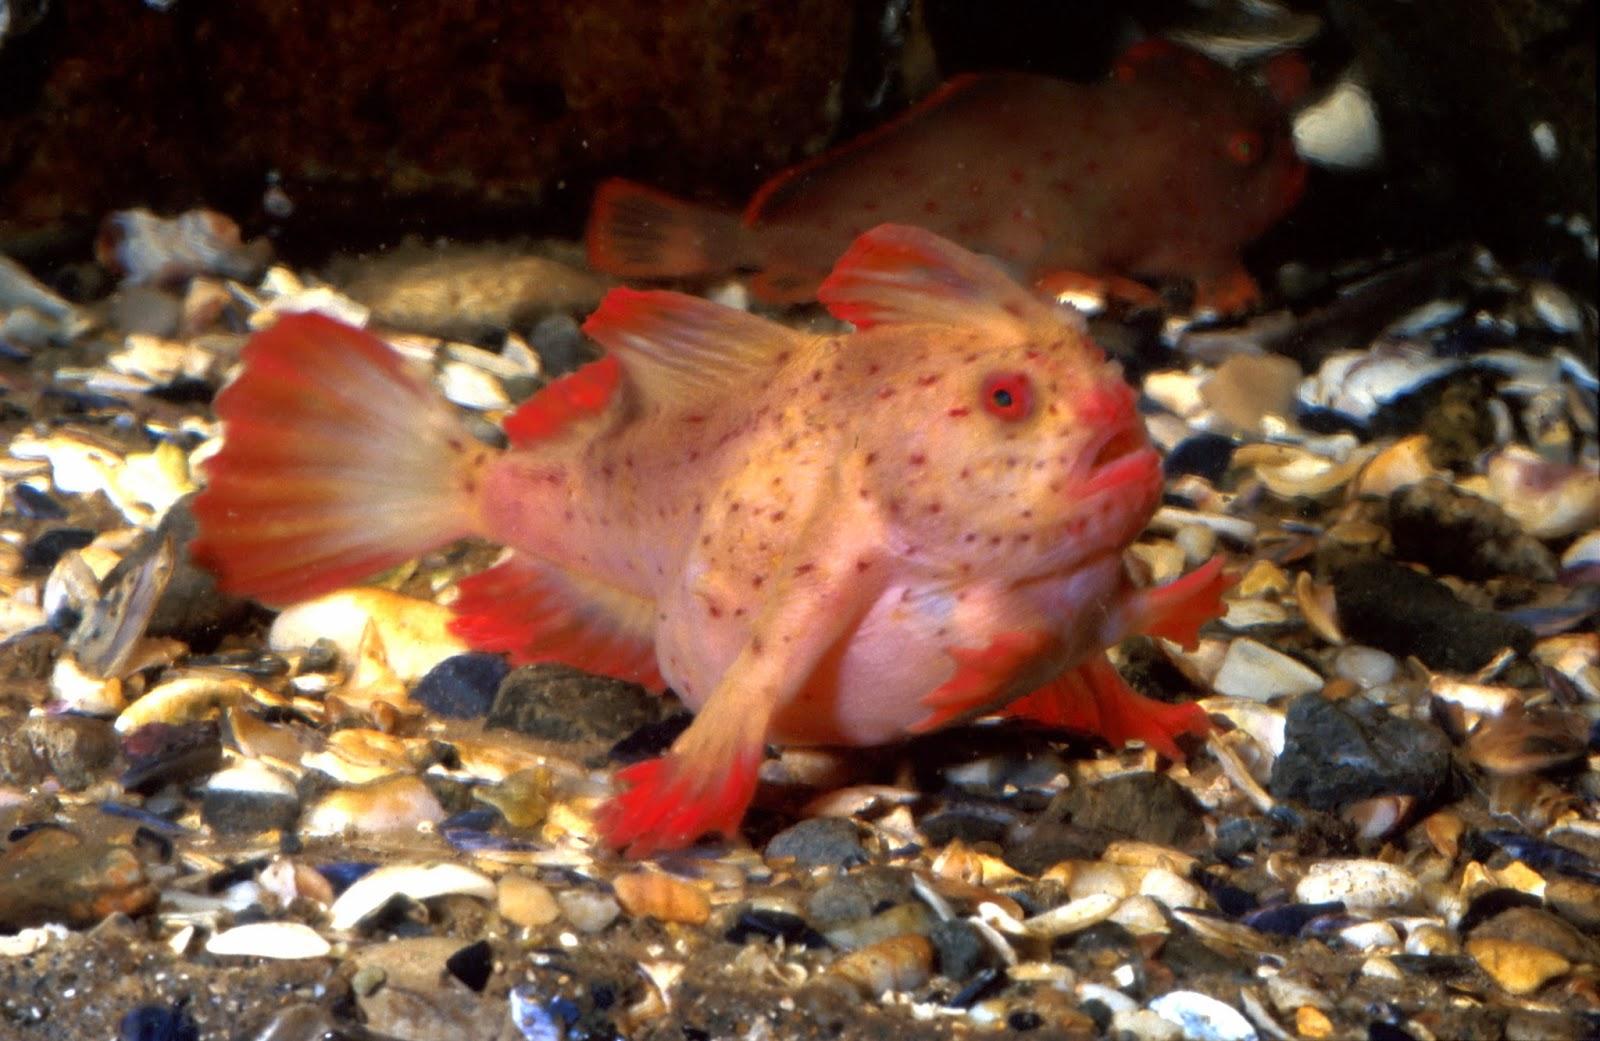 http://fishshare.blogspot.com/2015/01/handfish-pictures.html